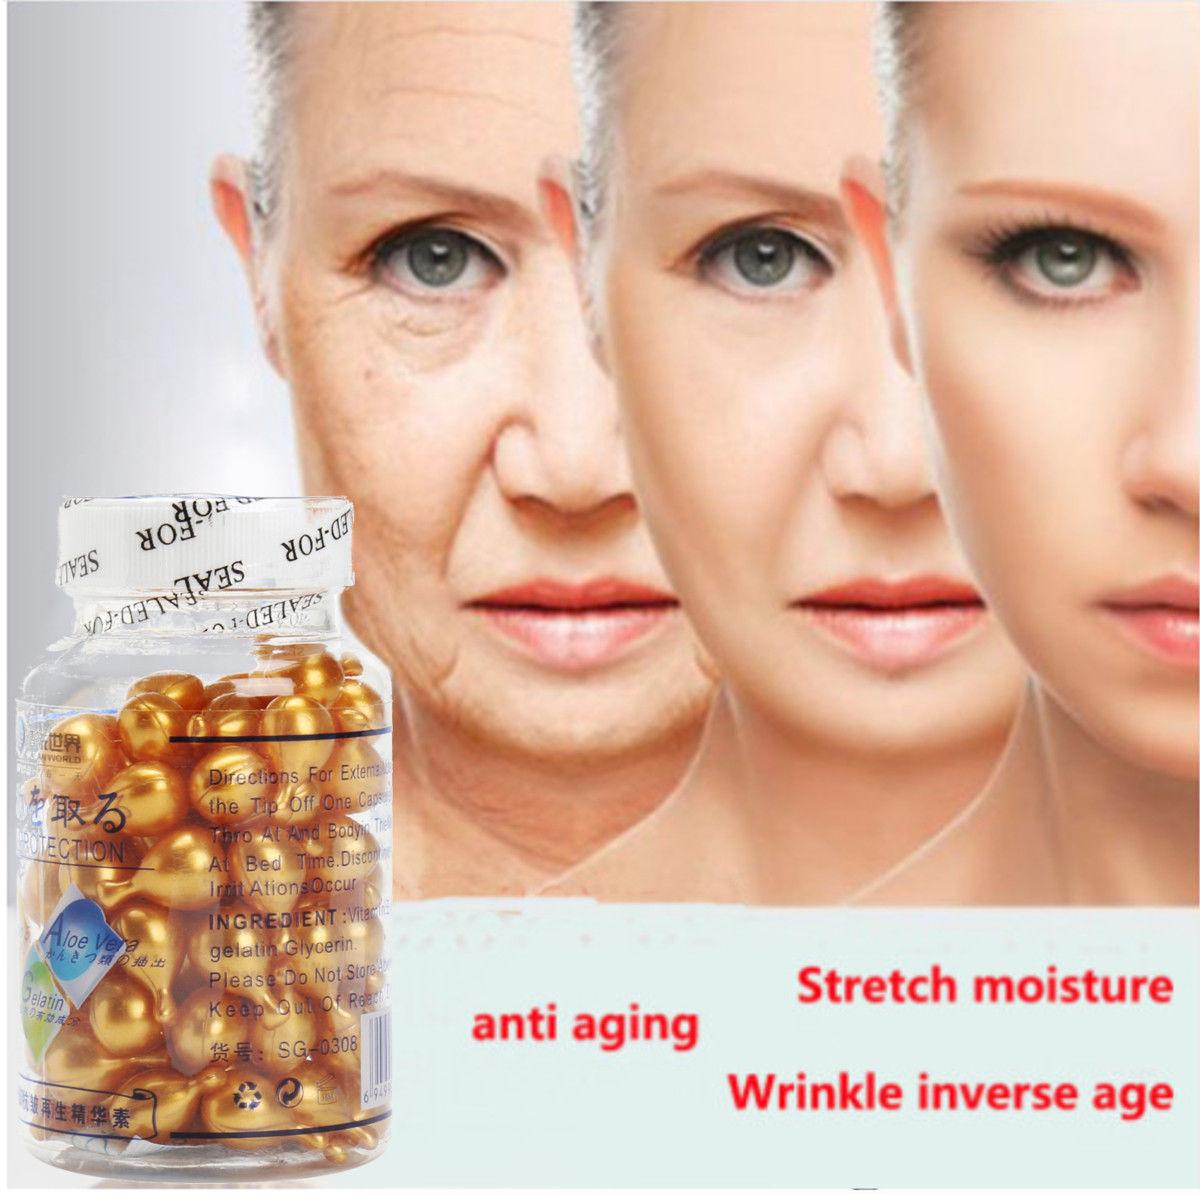 90Pcs/Bottle Snake Venom Extract Face Cream Anti-Wrinkle Whitening Anti Aging Moisturizing Wrinkle Remove 90 Capsules